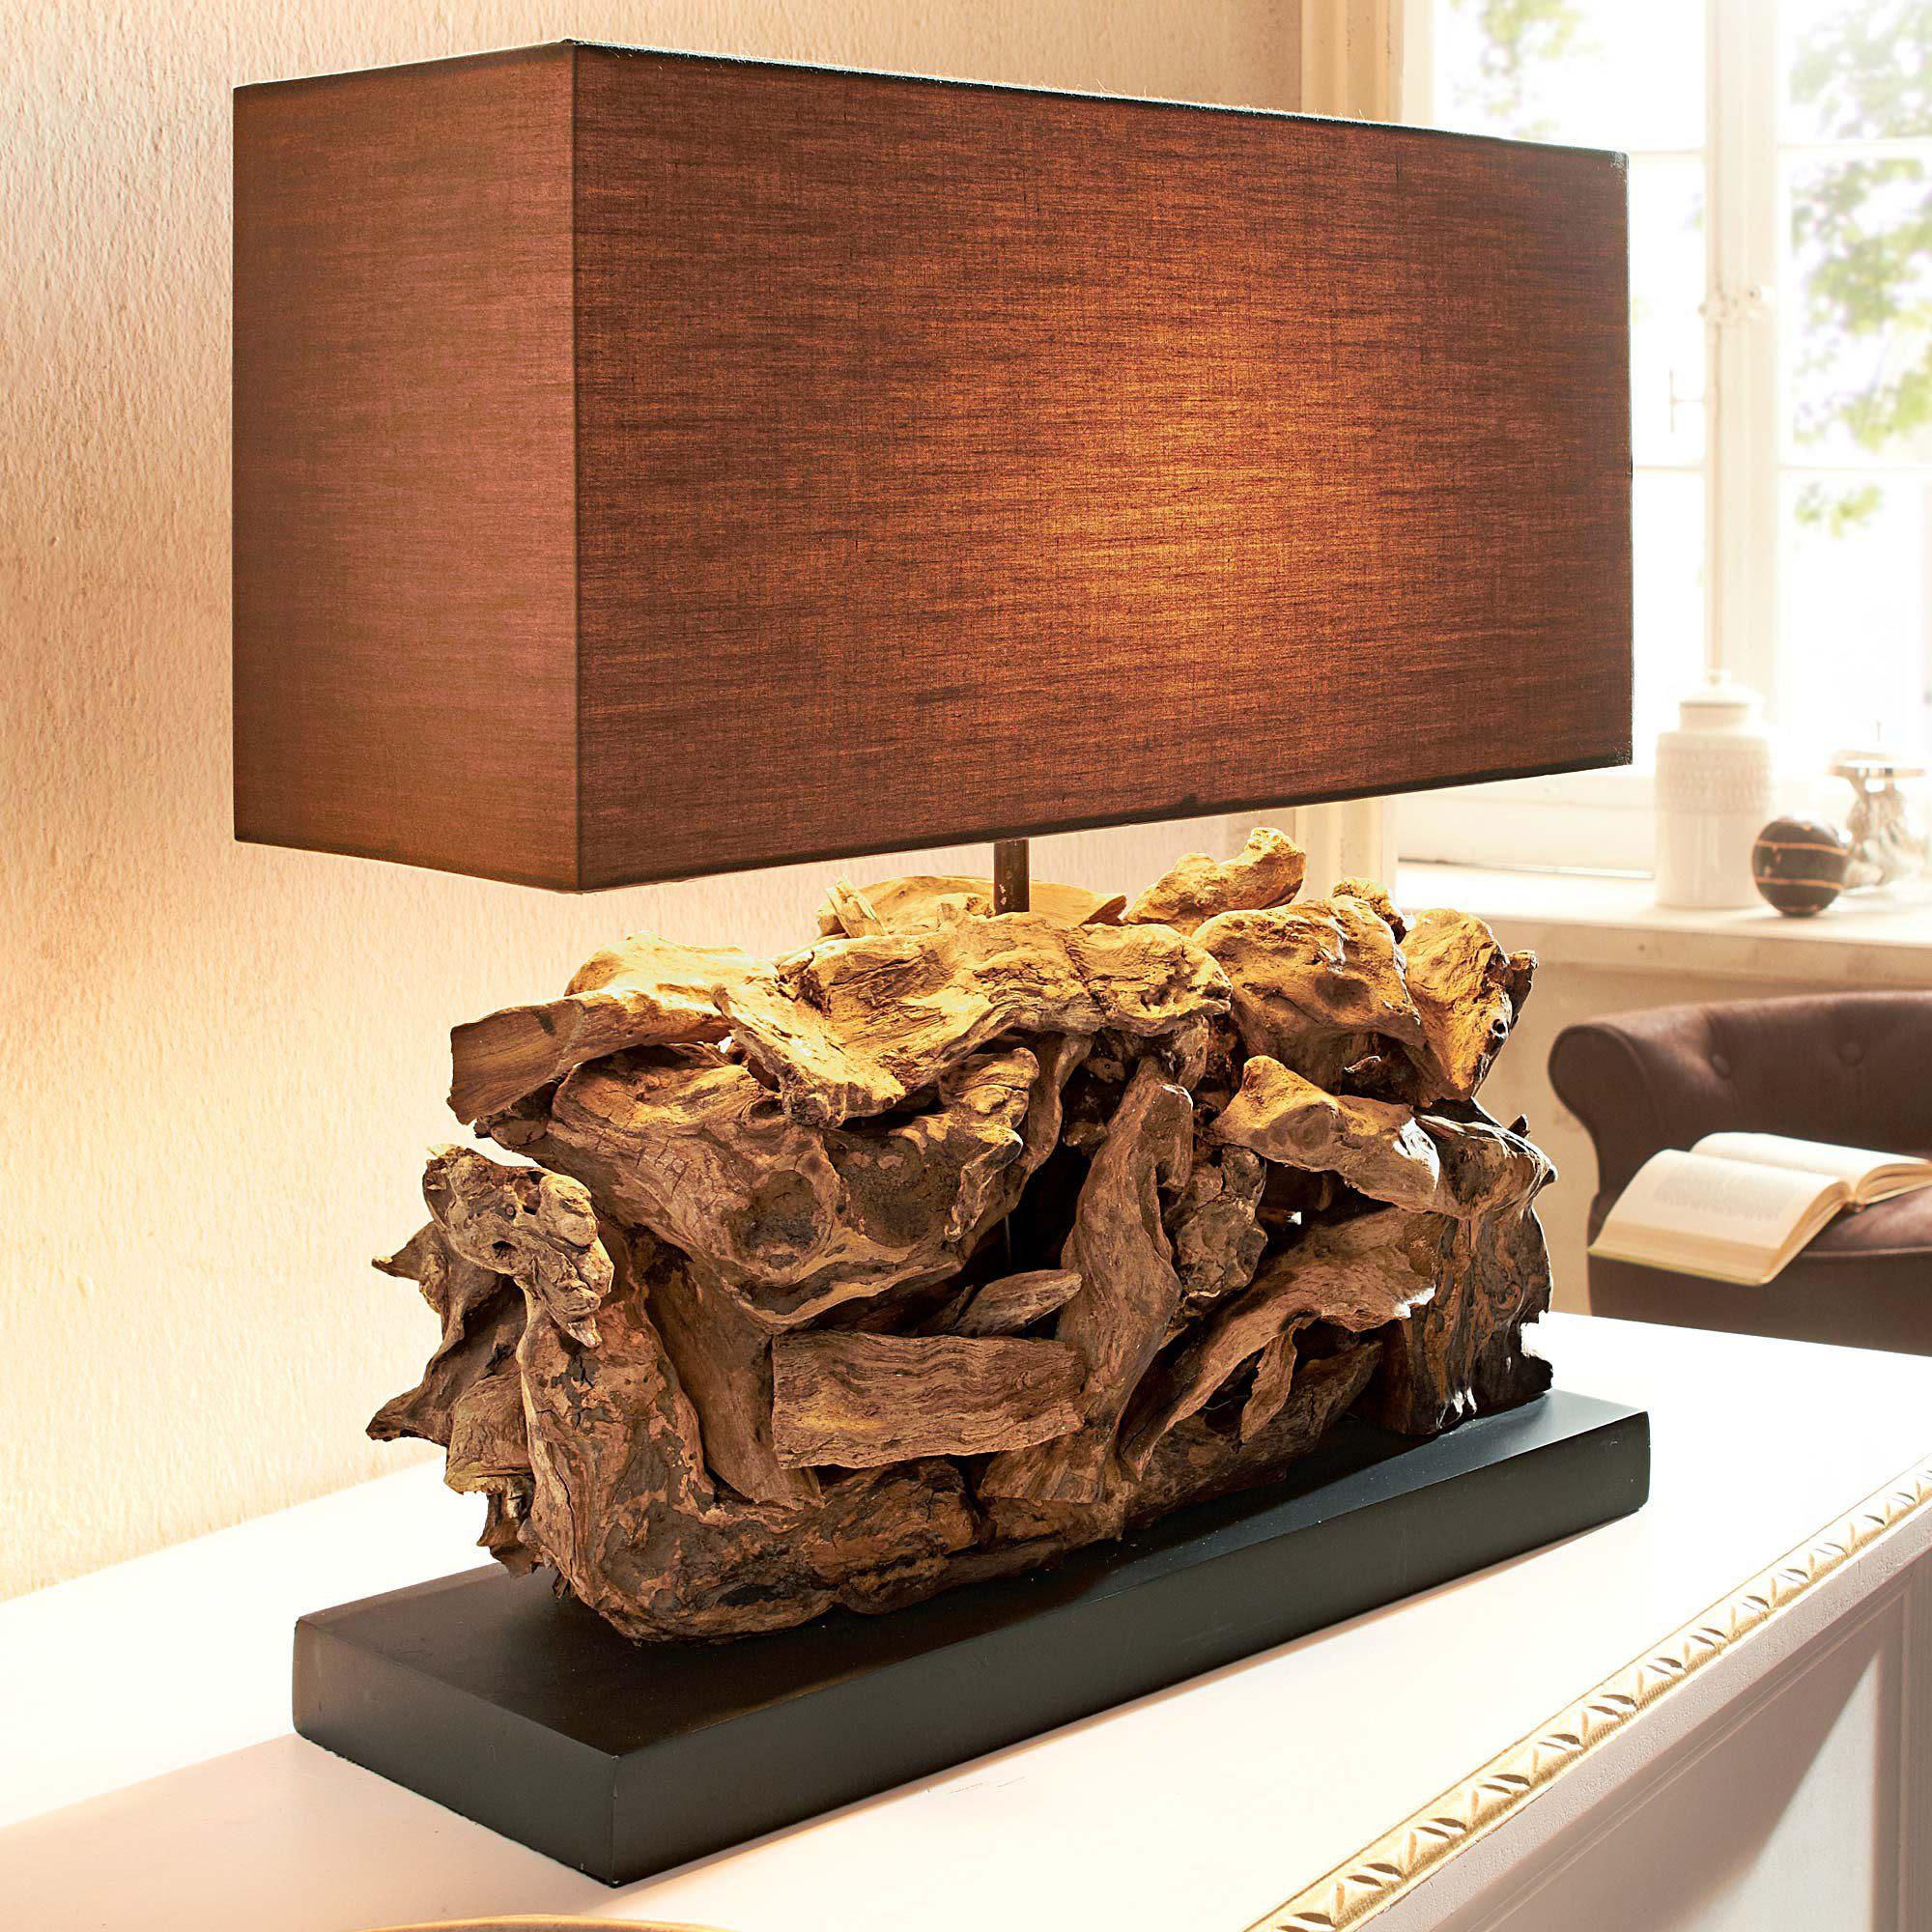 tischleuchte woody ii teakholzlampe tischlampe aus holz shabby chic design ebay. Black Bedroom Furniture Sets. Home Design Ideas